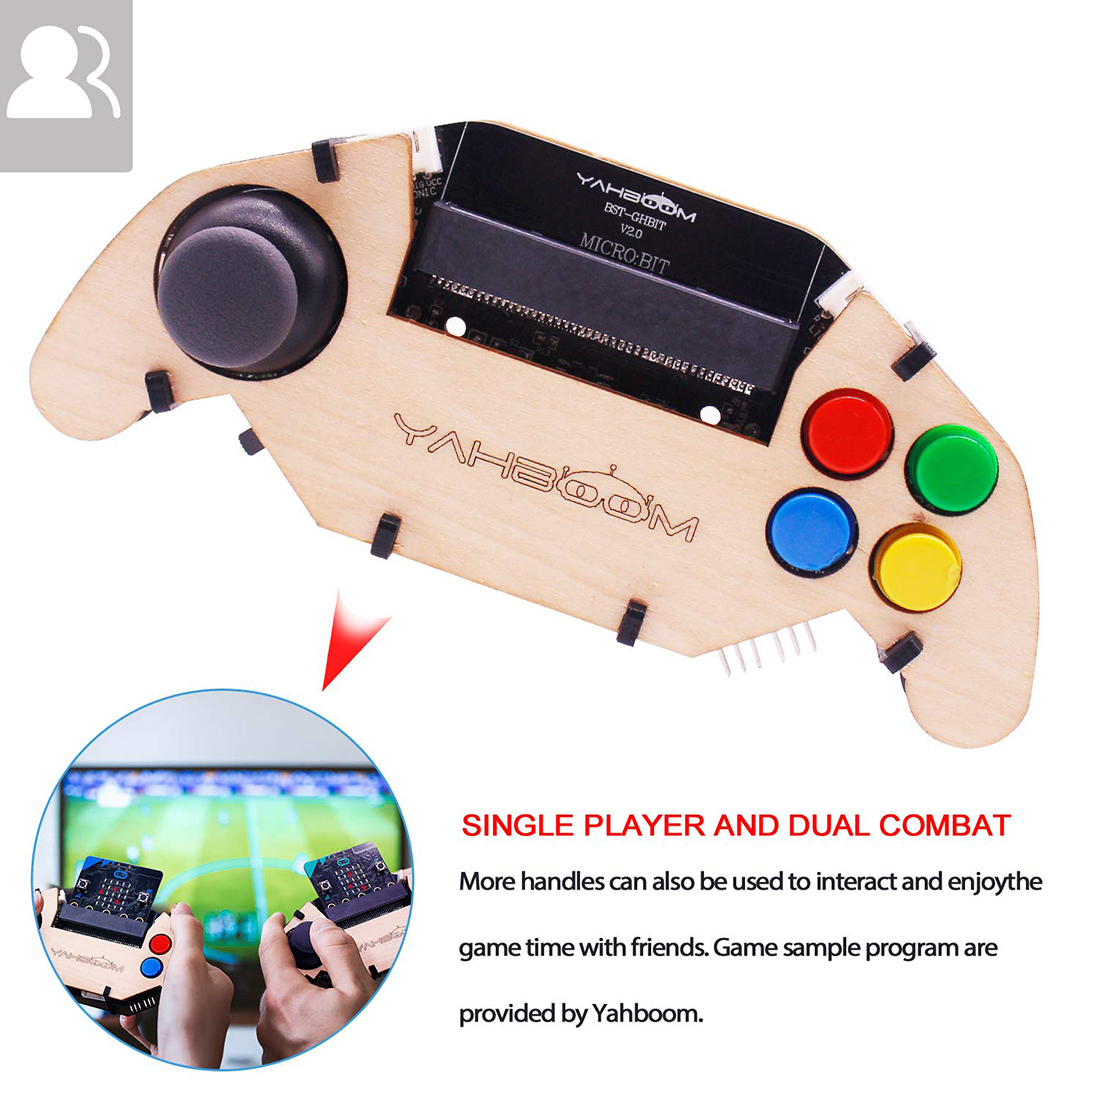 Micro:bit Individual Gamepad Expansion Board Handle Microbit Robot Car Joystick Toys Programming Game Controller